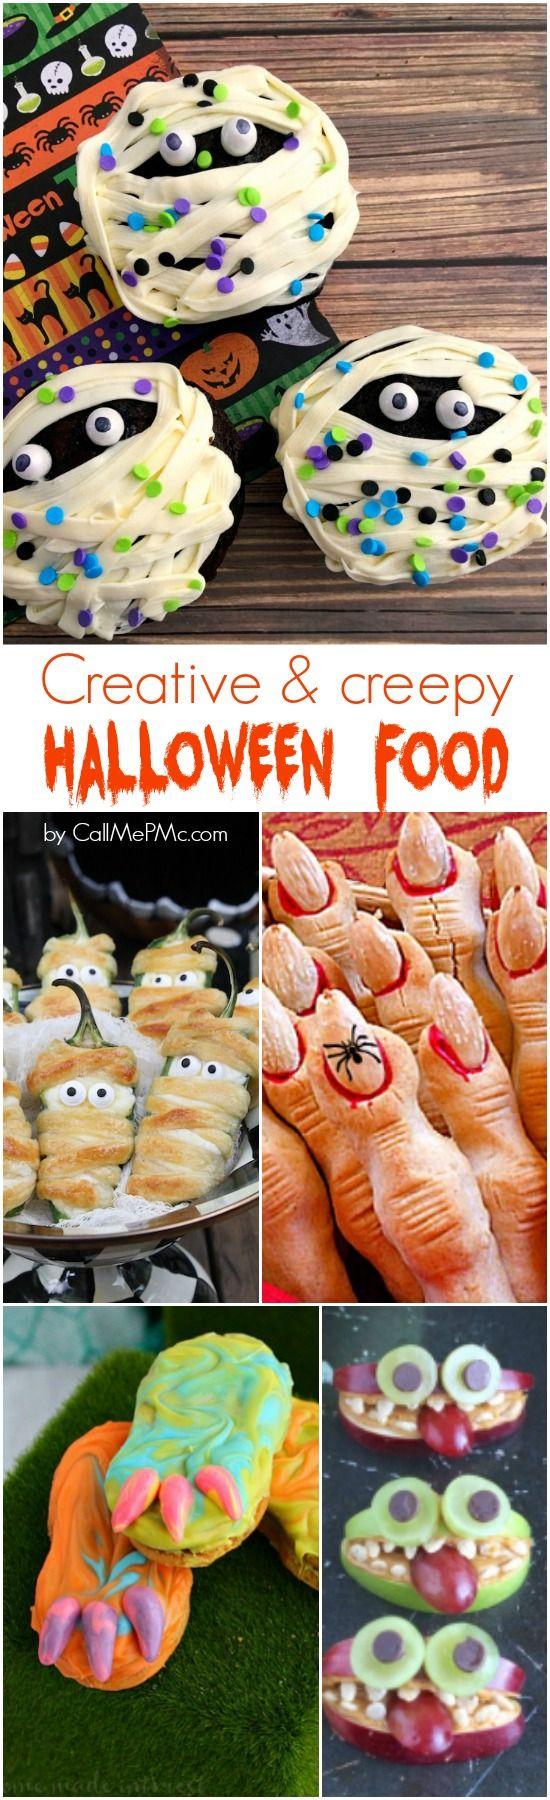 Double chocolate breyer s gelato sandwich cookies recipe for Creative ideas for halloween treats